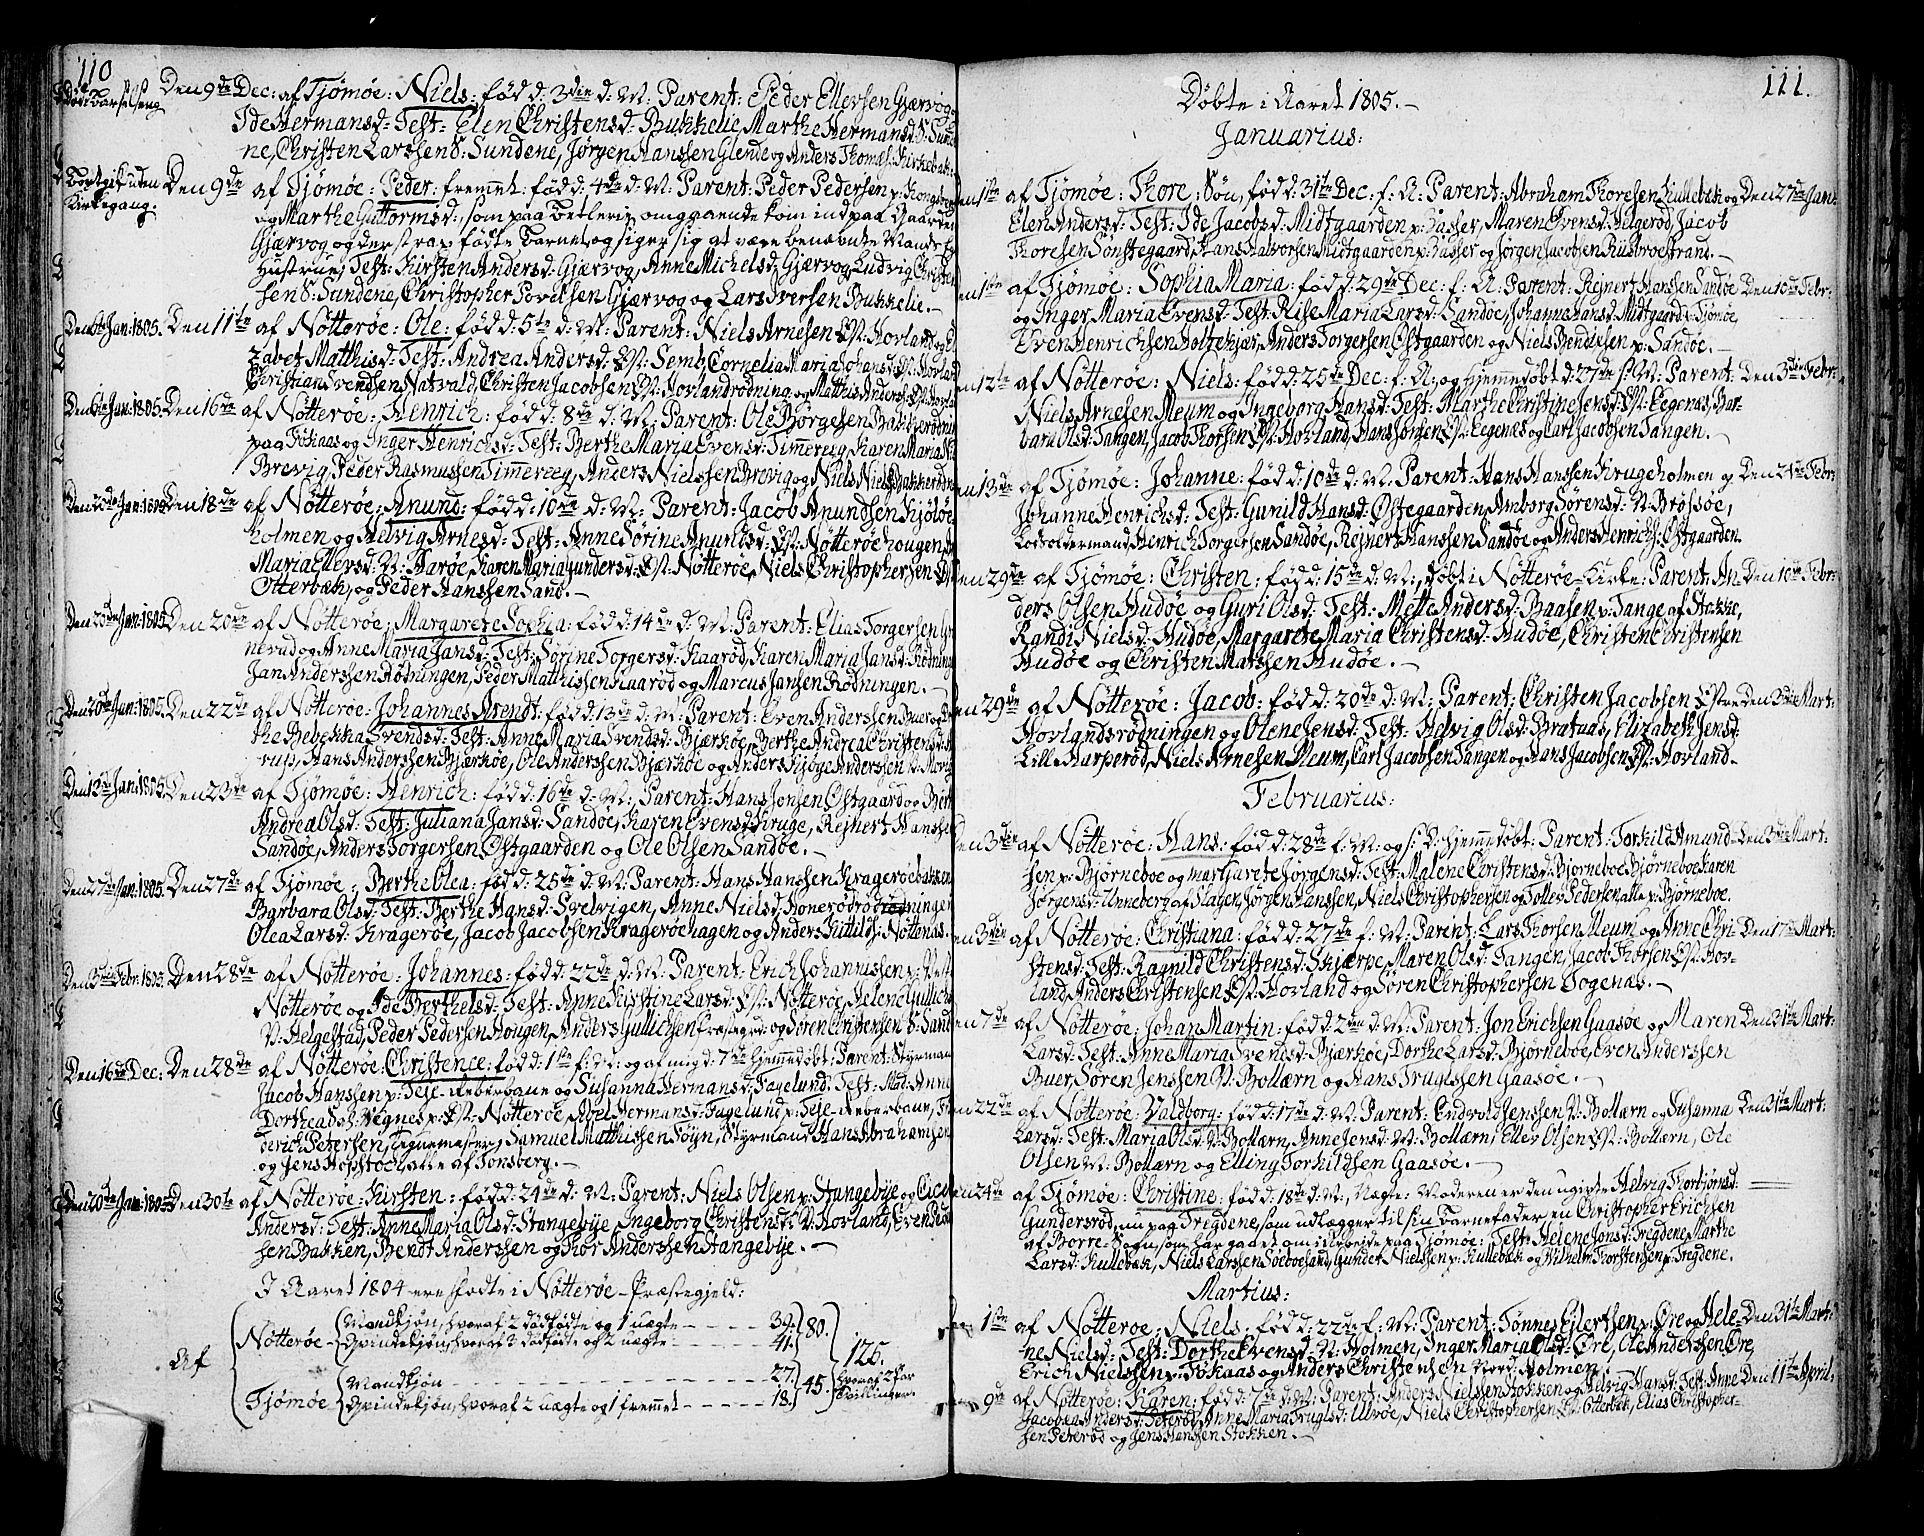 SAKO, Nøtterøy kirkebøker, F/Fa/L0003: Ministerialbok nr. I 3, 1791-1814, s. 110-111